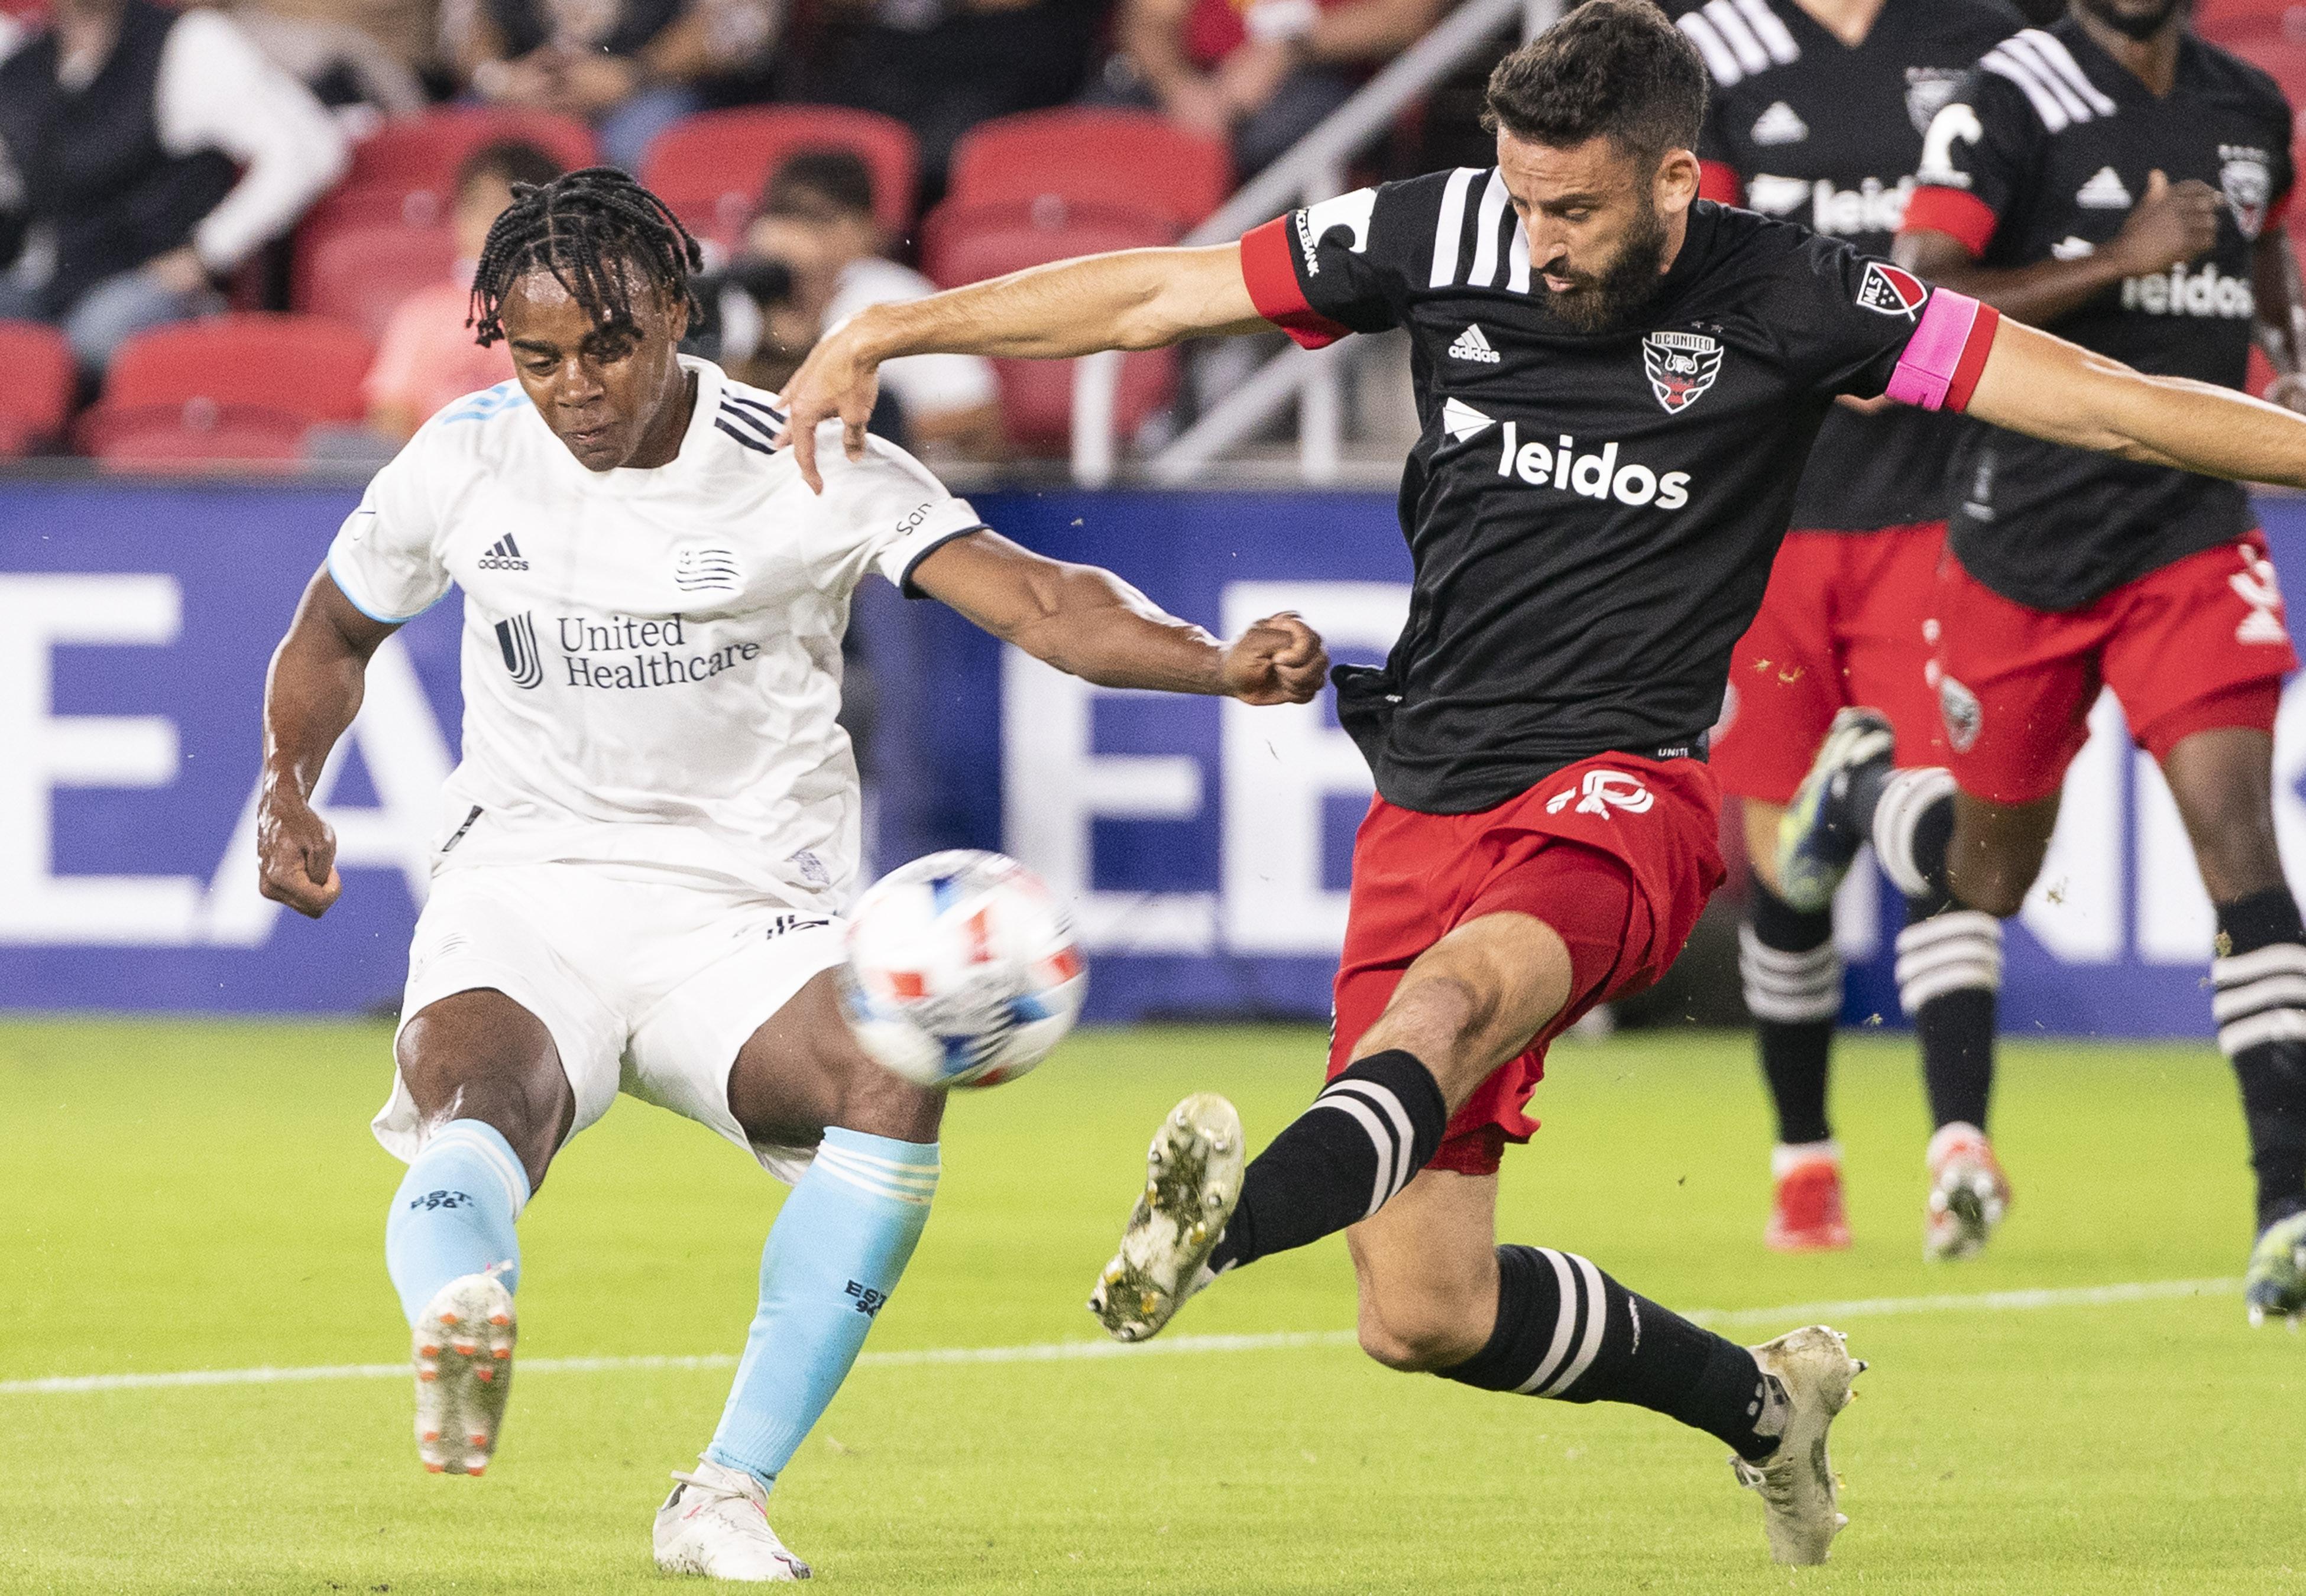 SOCCER: OCT 20 MLS - New England Revolution at DC United